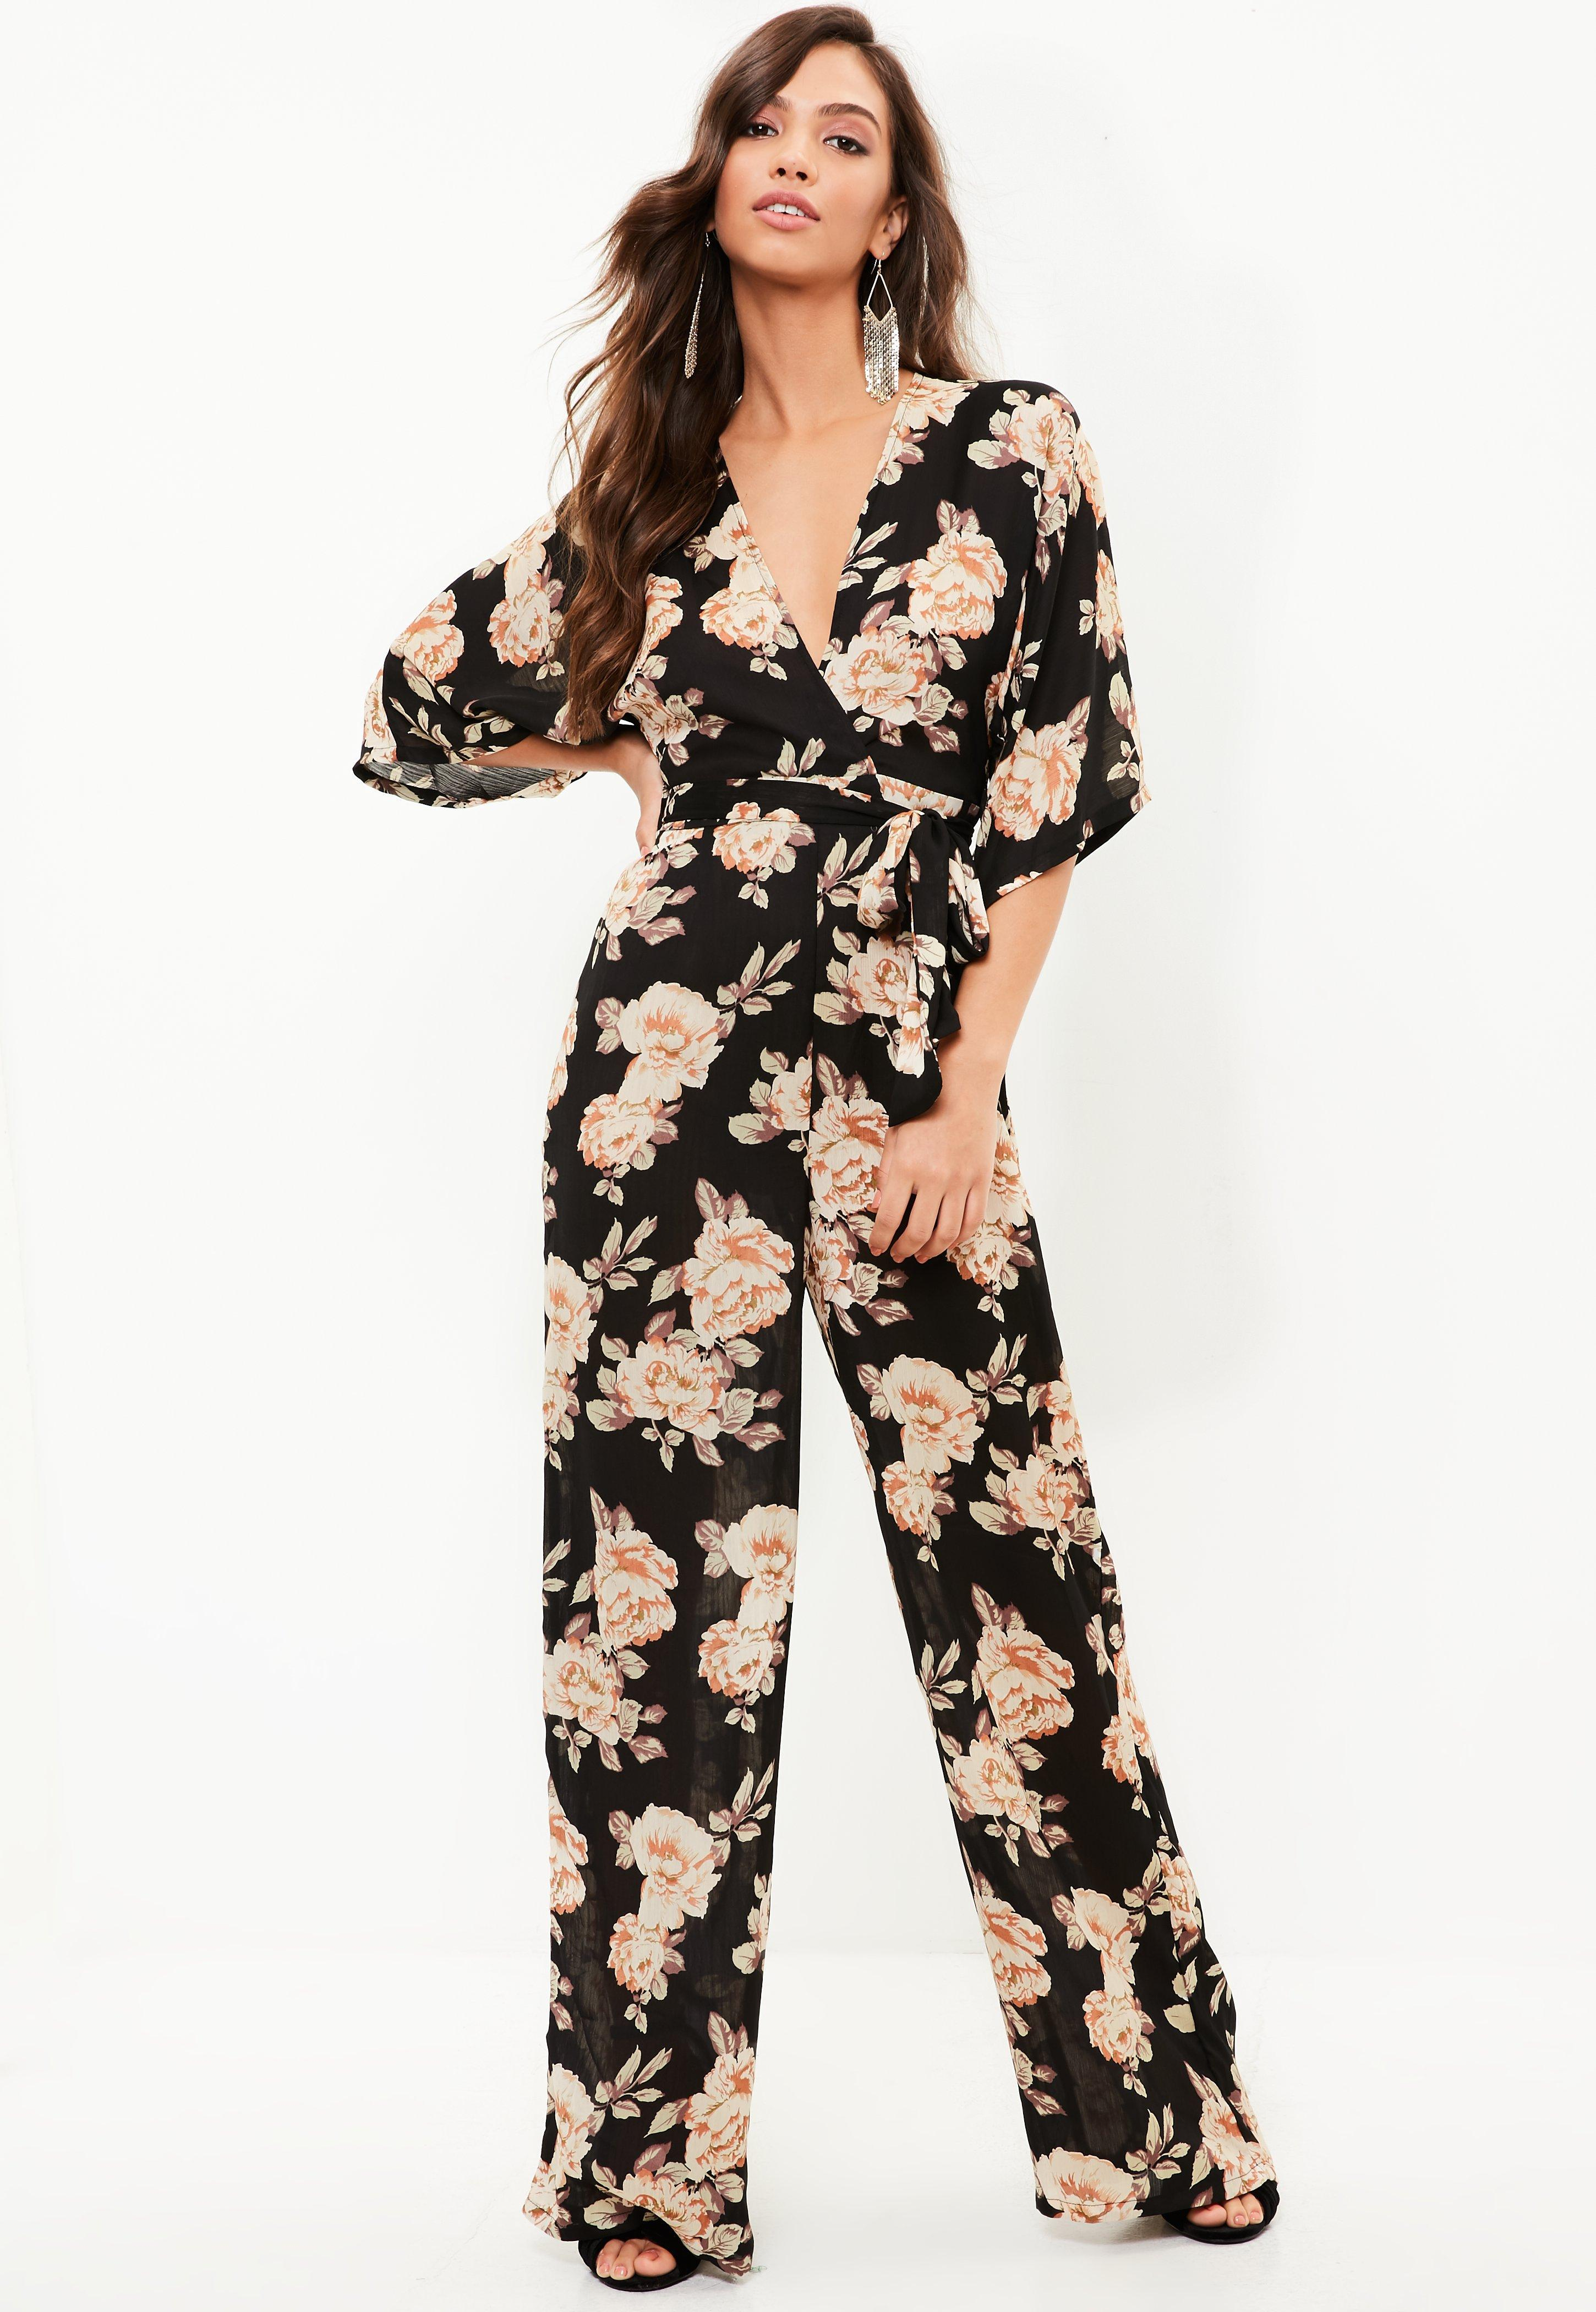 710952eee6f Lyst - Missguided Black Floral Kimono Wide Leg Jumpsuit in Black